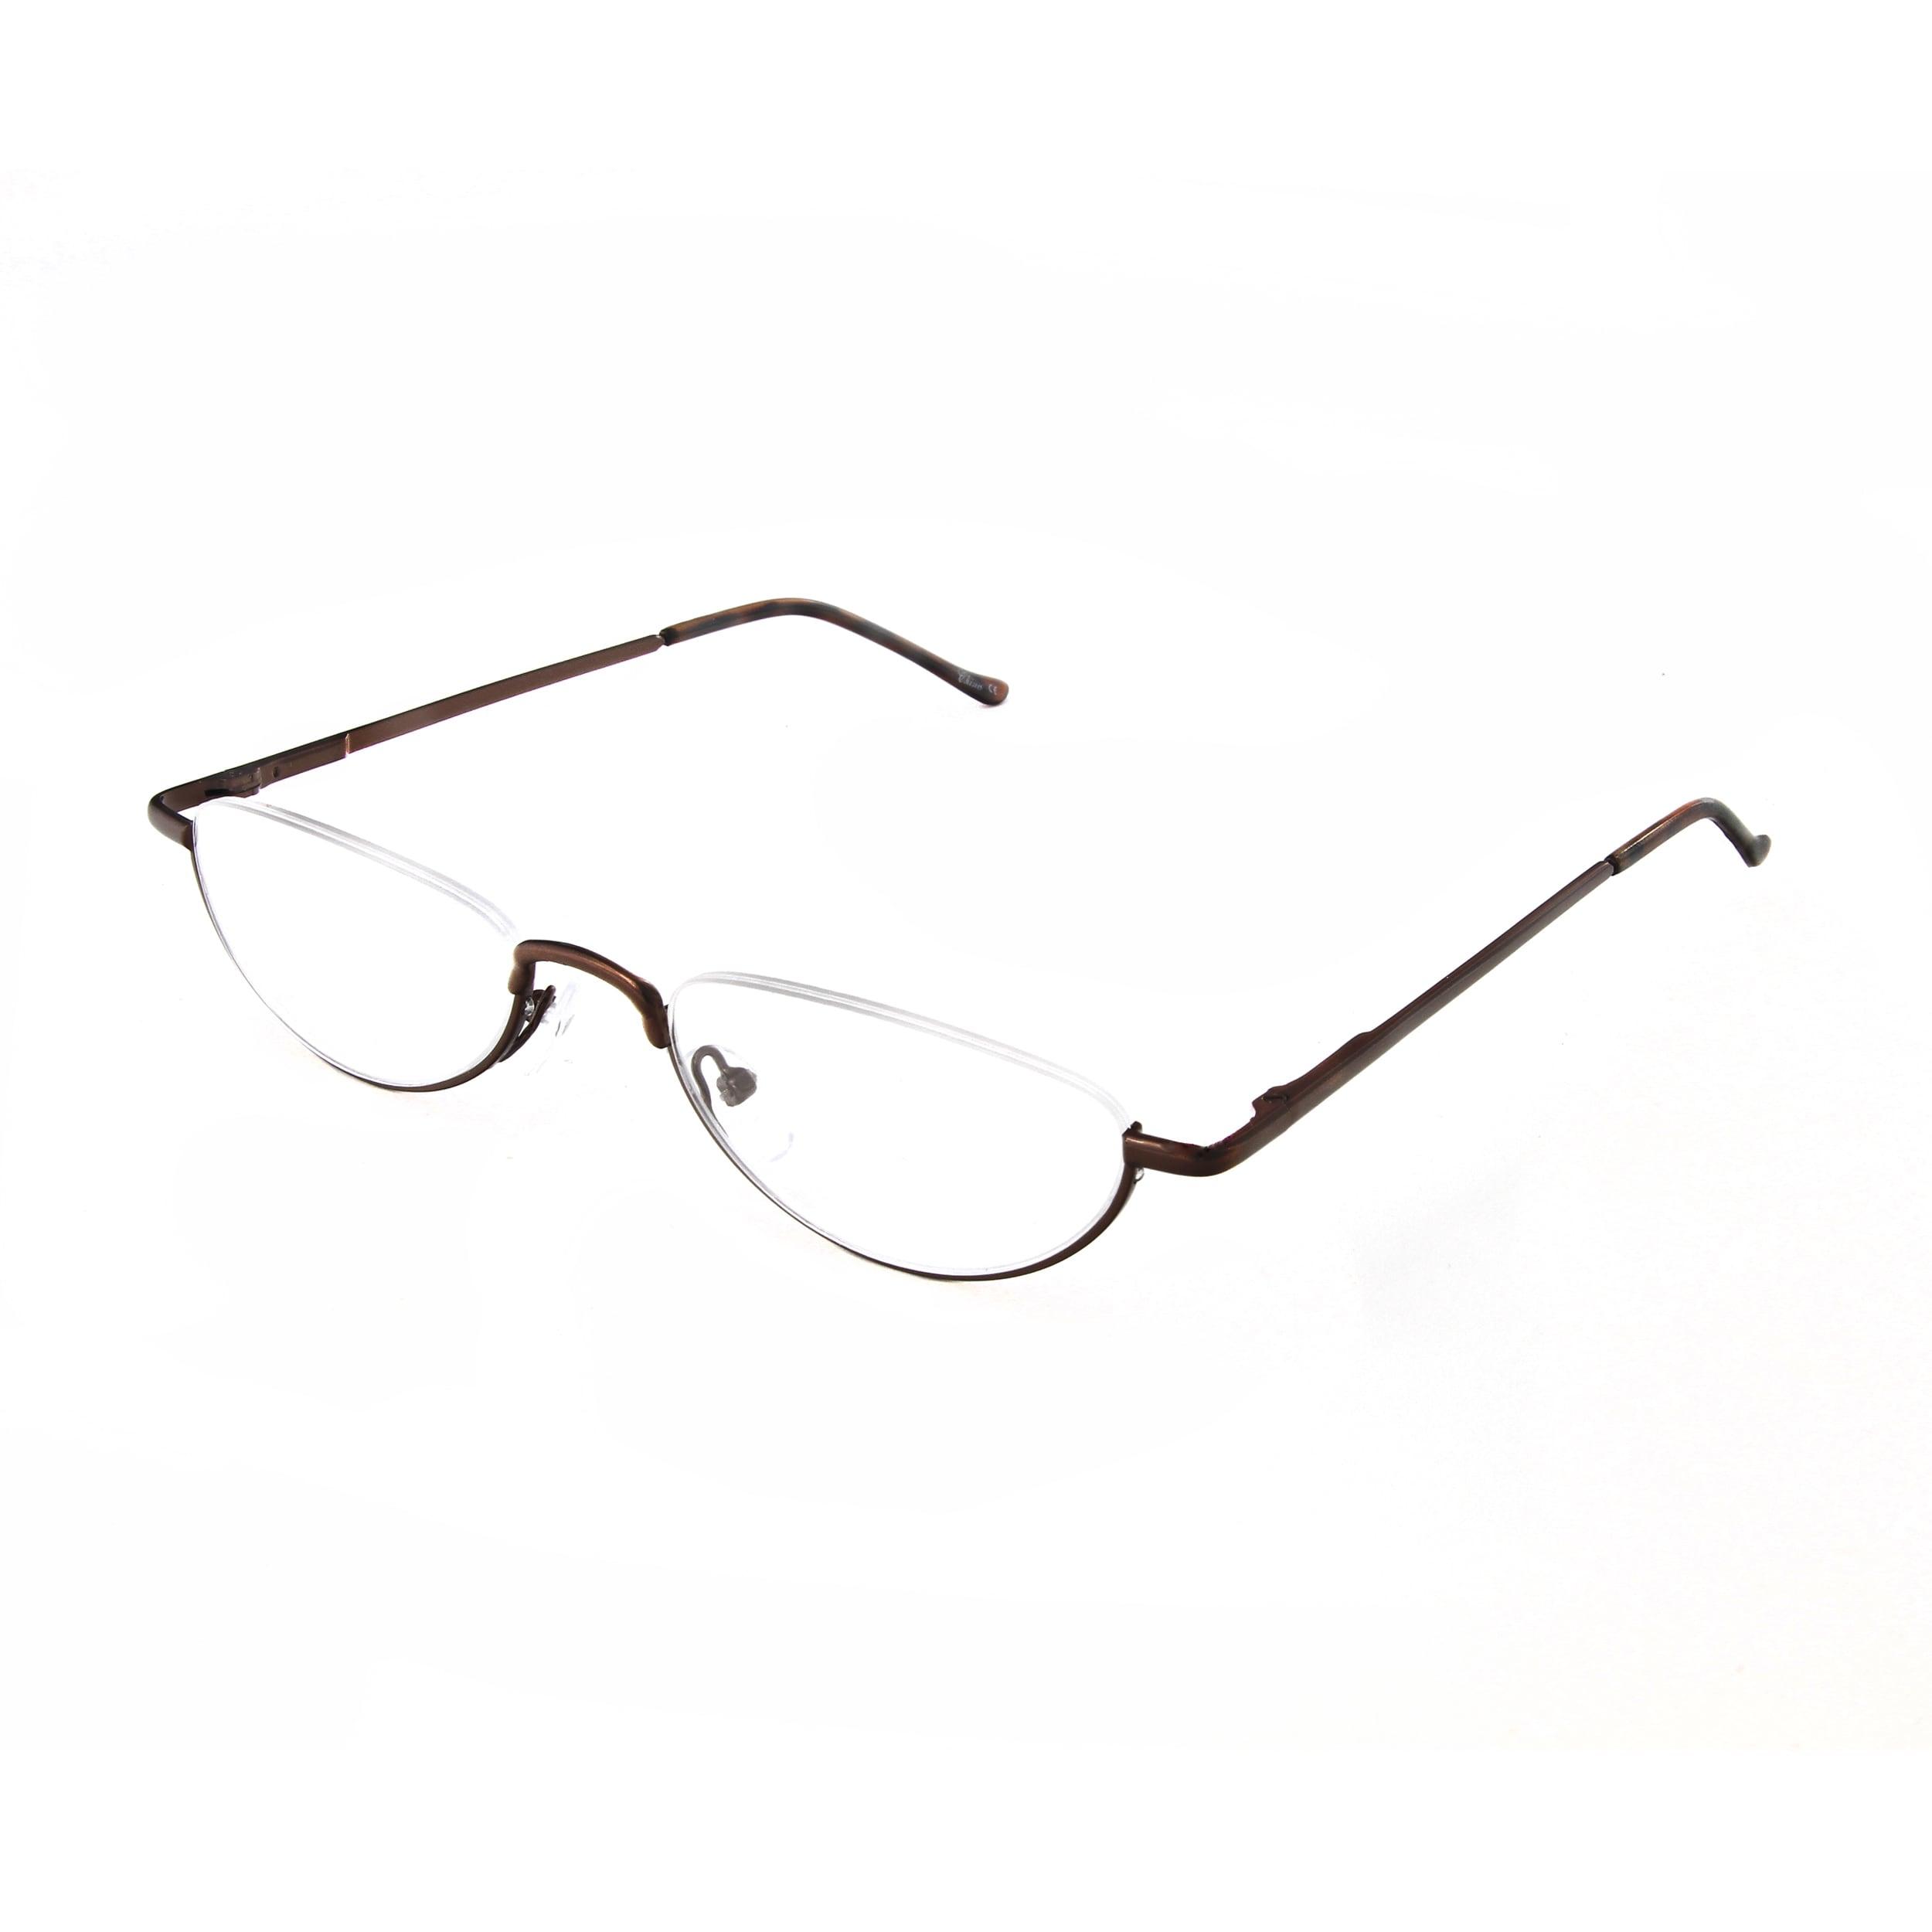 8b4305b3183a Shop Hot Optix Unisex Oval Semi-rimless Reading Glasses - Free ...